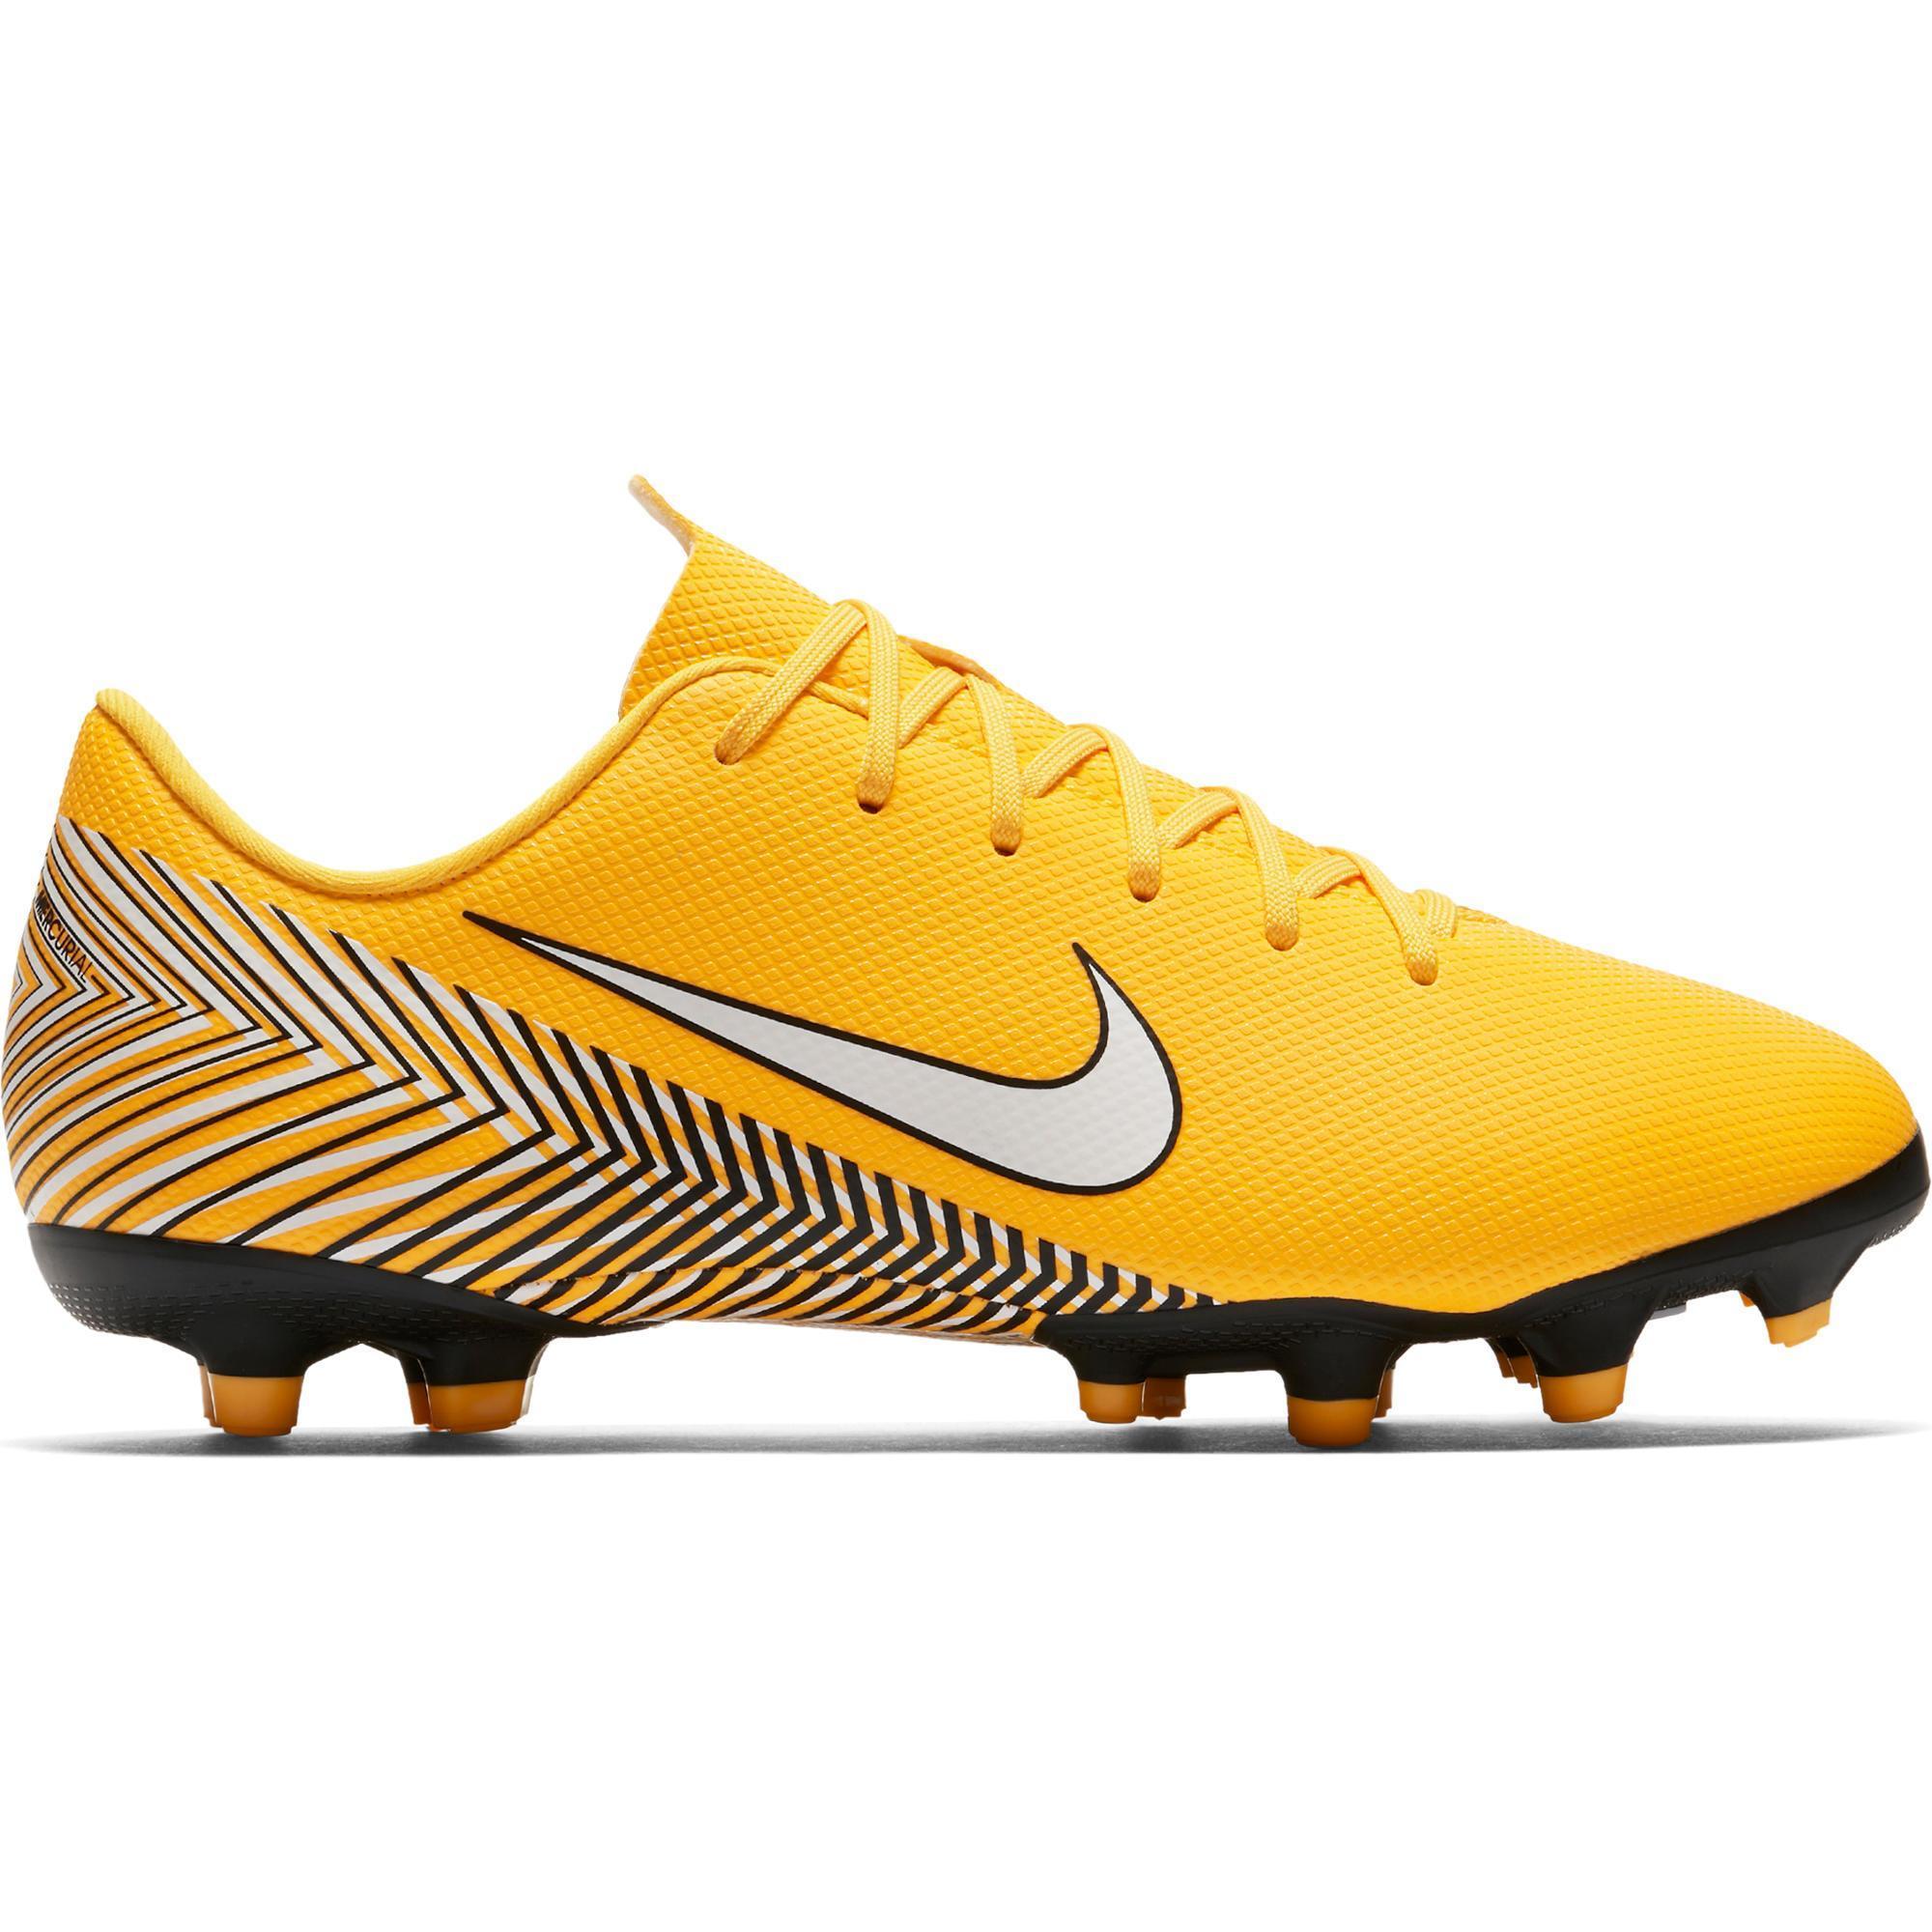 ed46ceead3 Chaussure Nike De Football Neymar Enfant Vapor Academy Decathlon Mg wwxZ1q